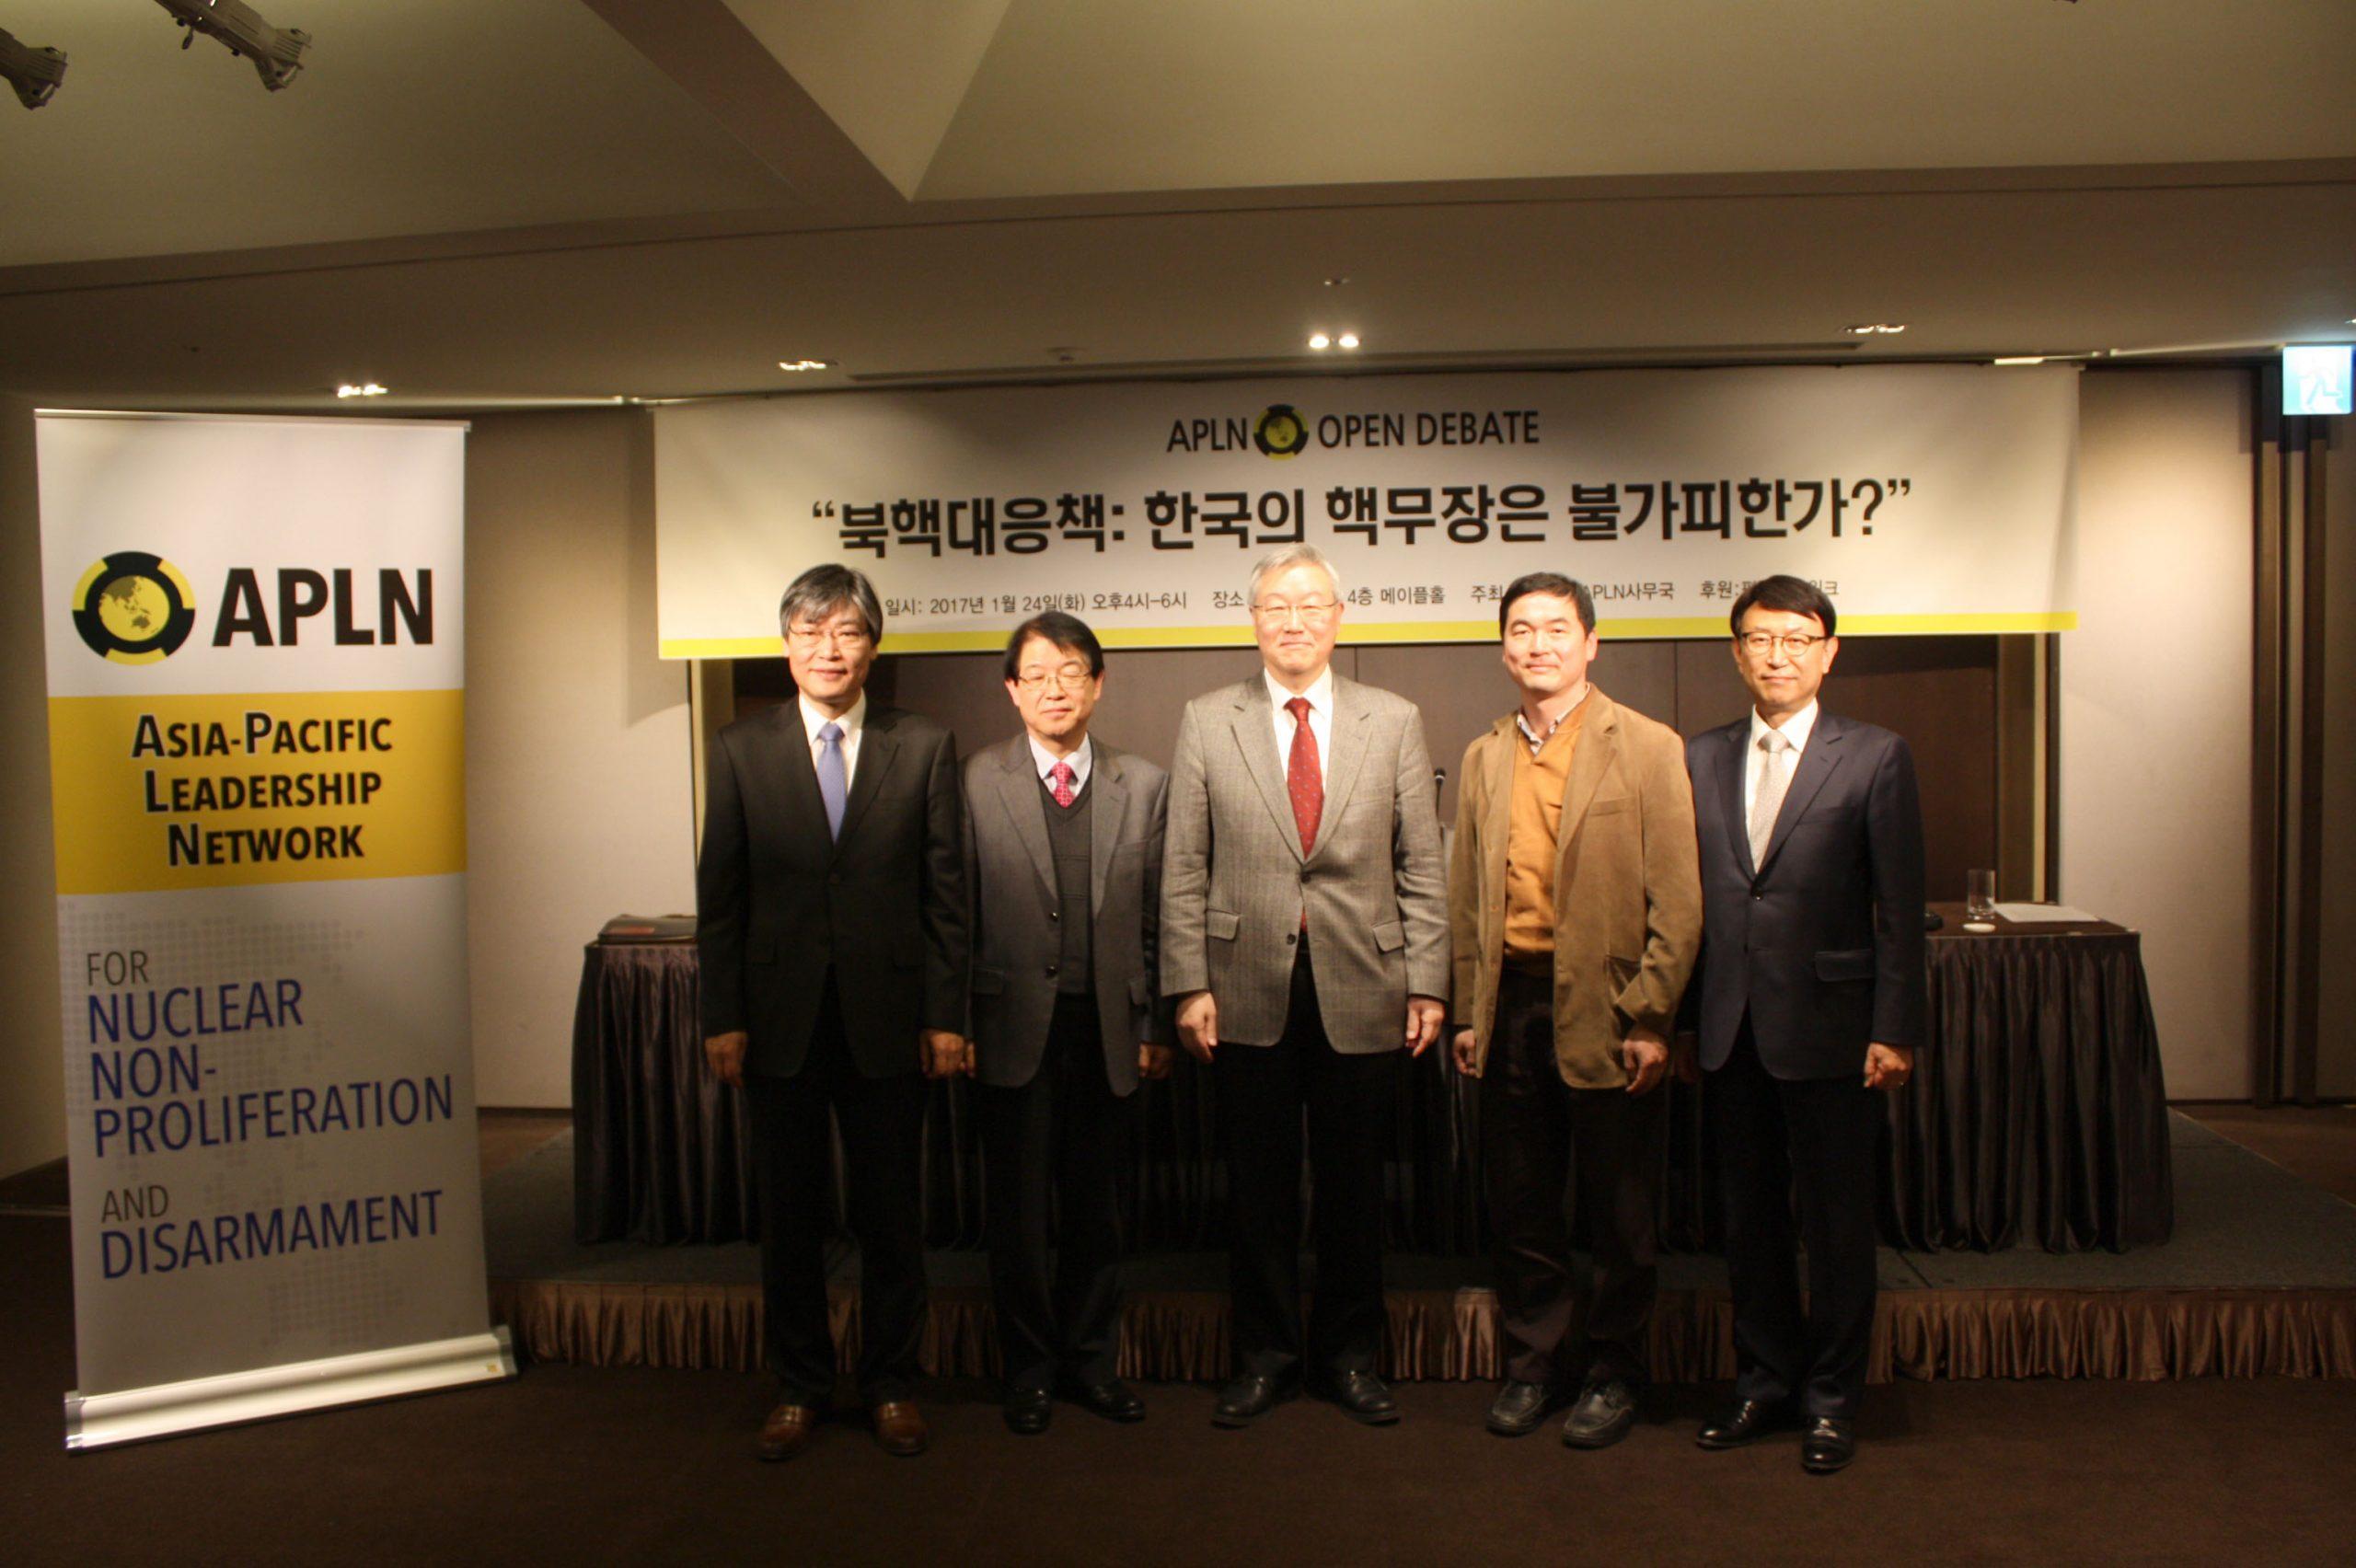 APLN Open Debate in Seoul